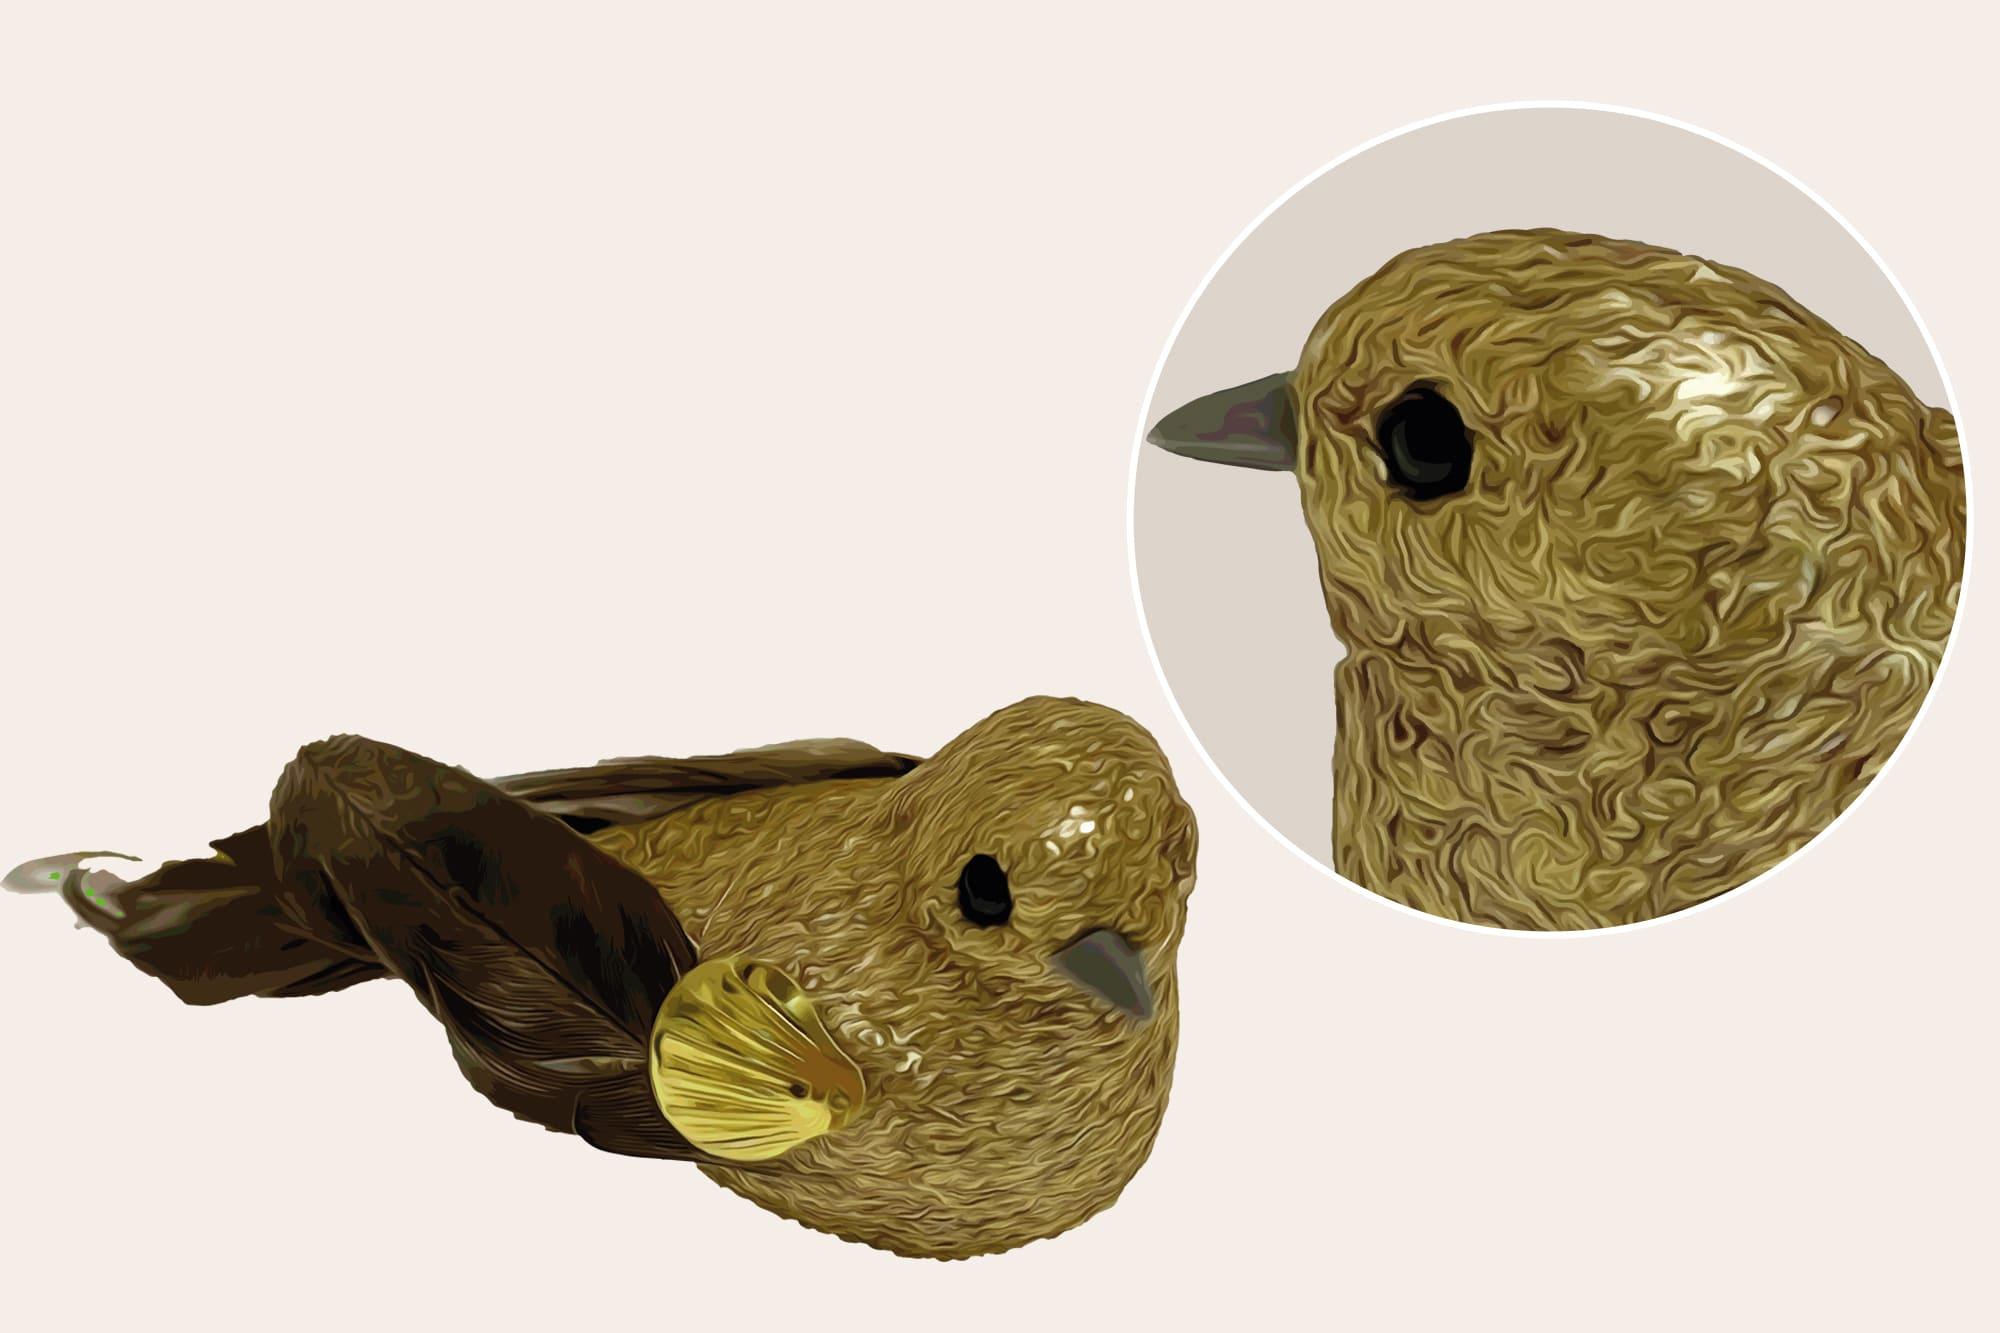 496 Christmas Illustrations: Christmas Vectors Bundle SVG, EPS, AI - Birds 2b